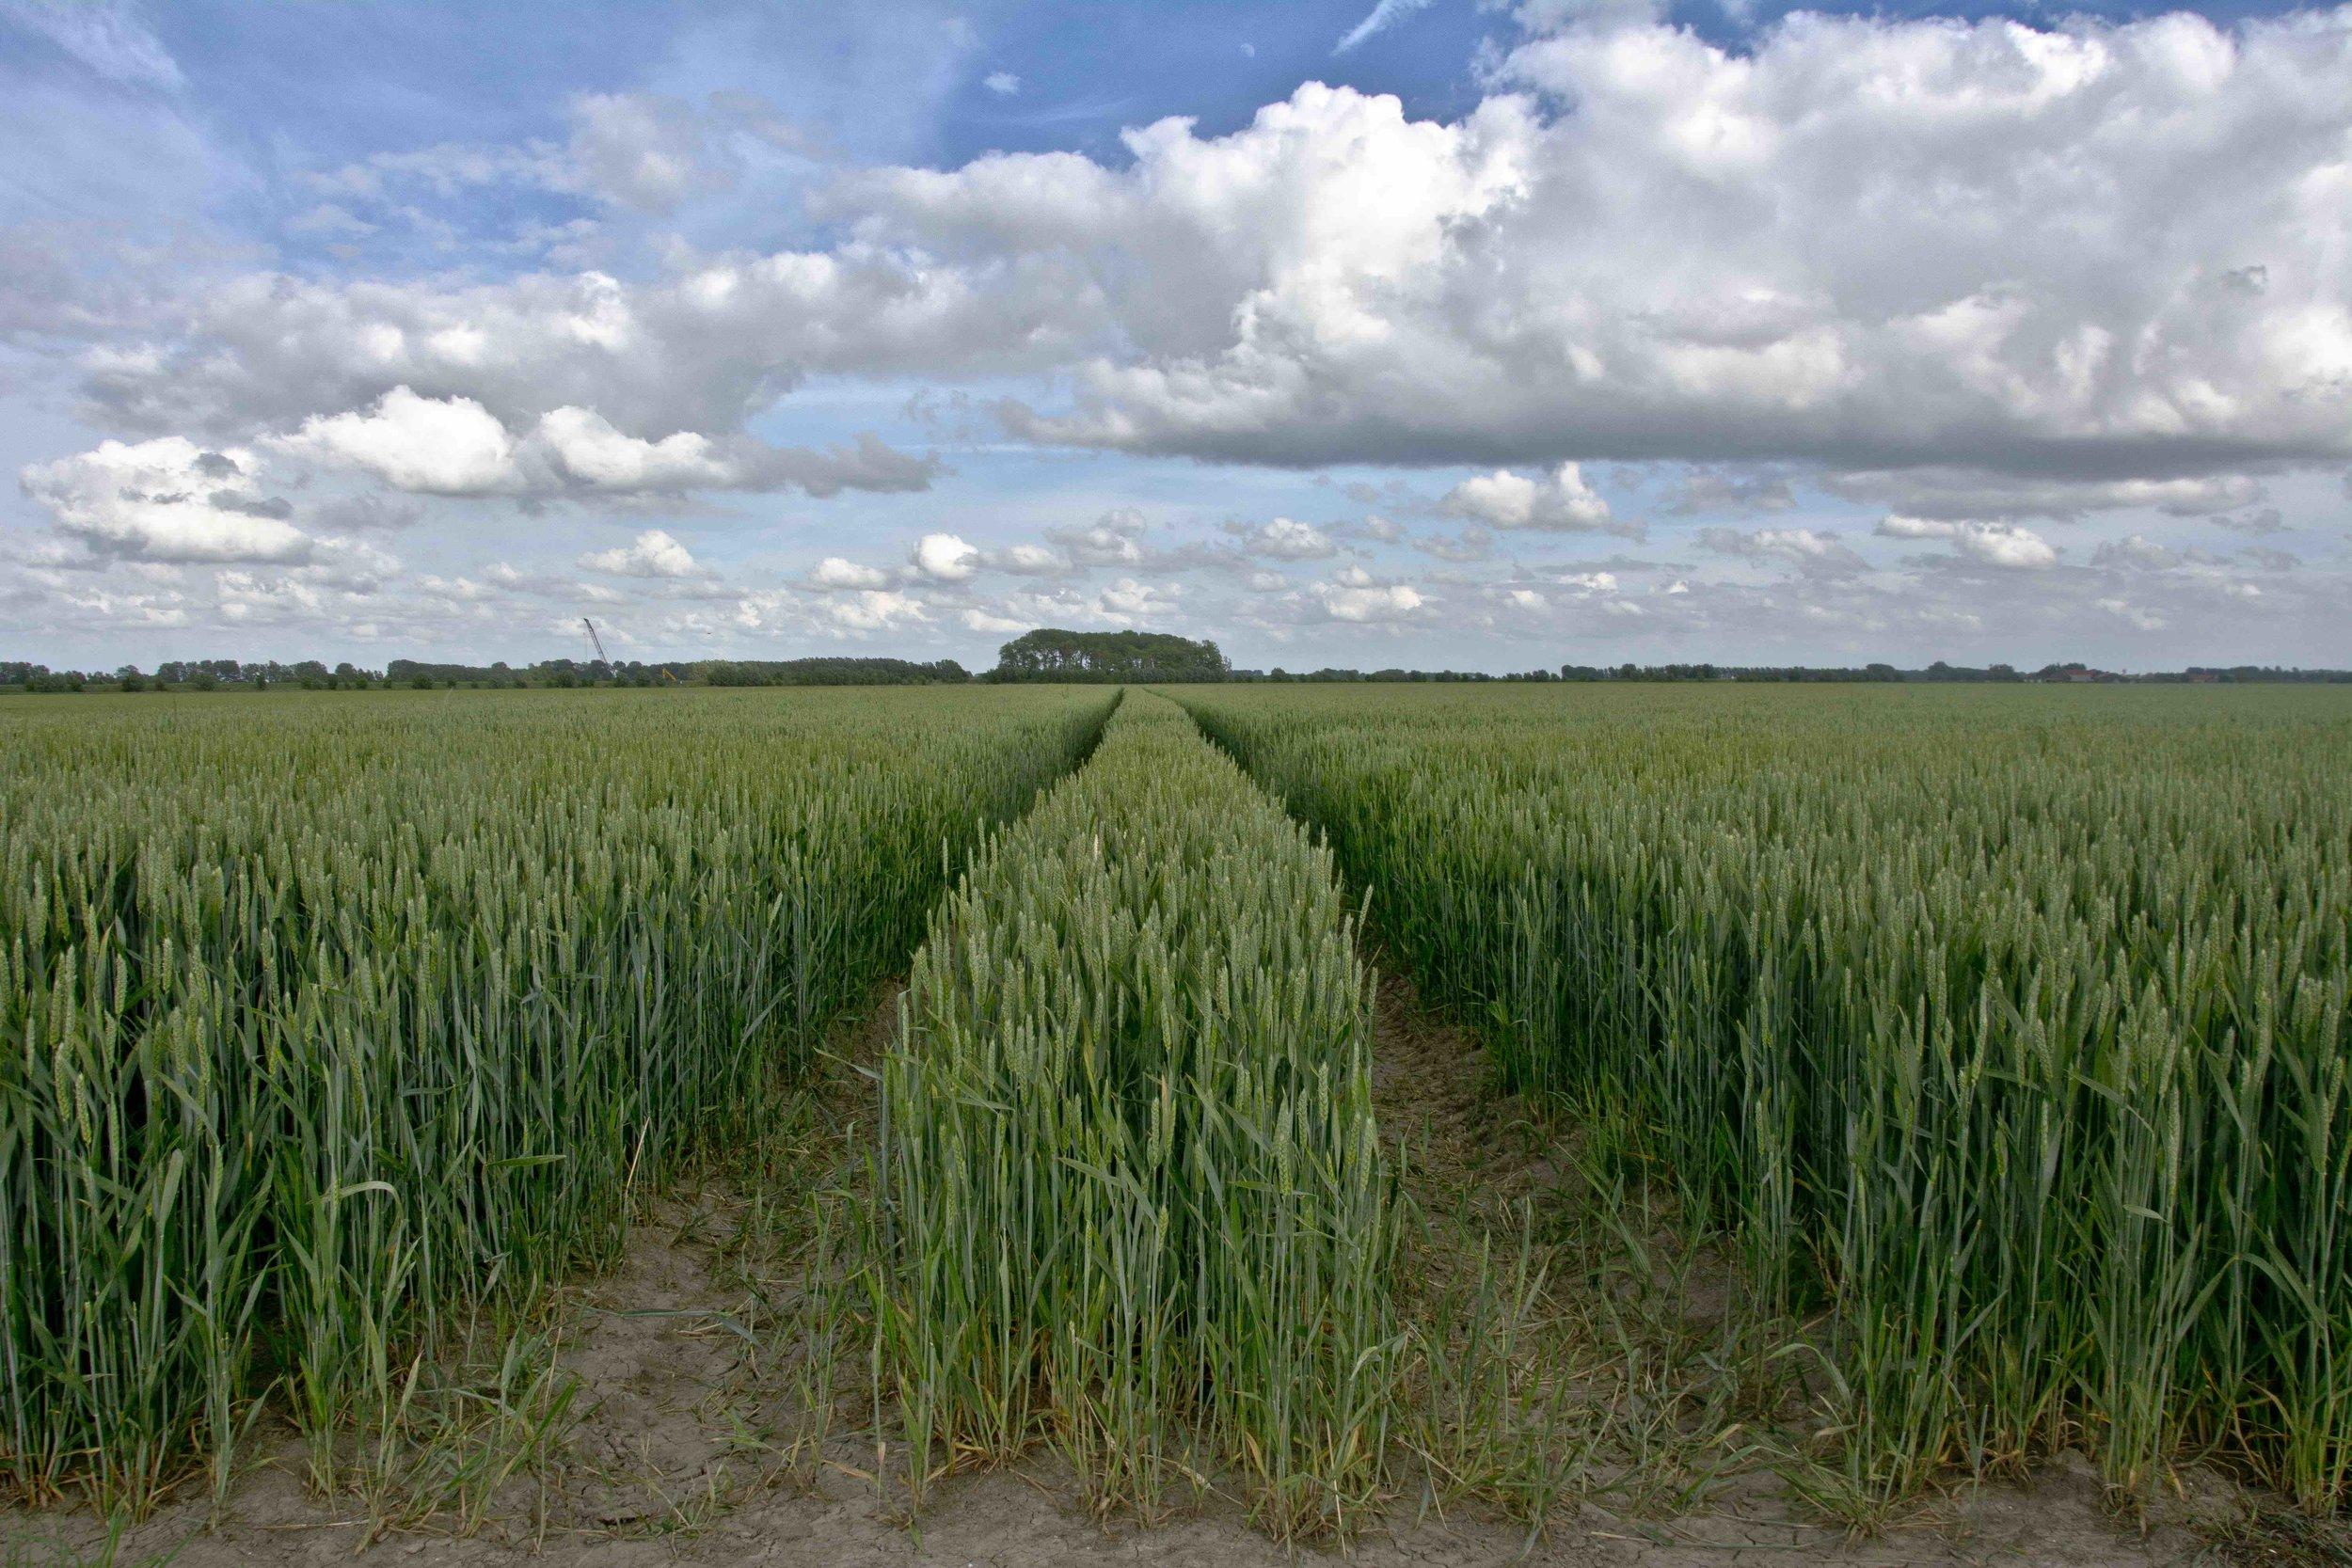 Wheat field in Belgium